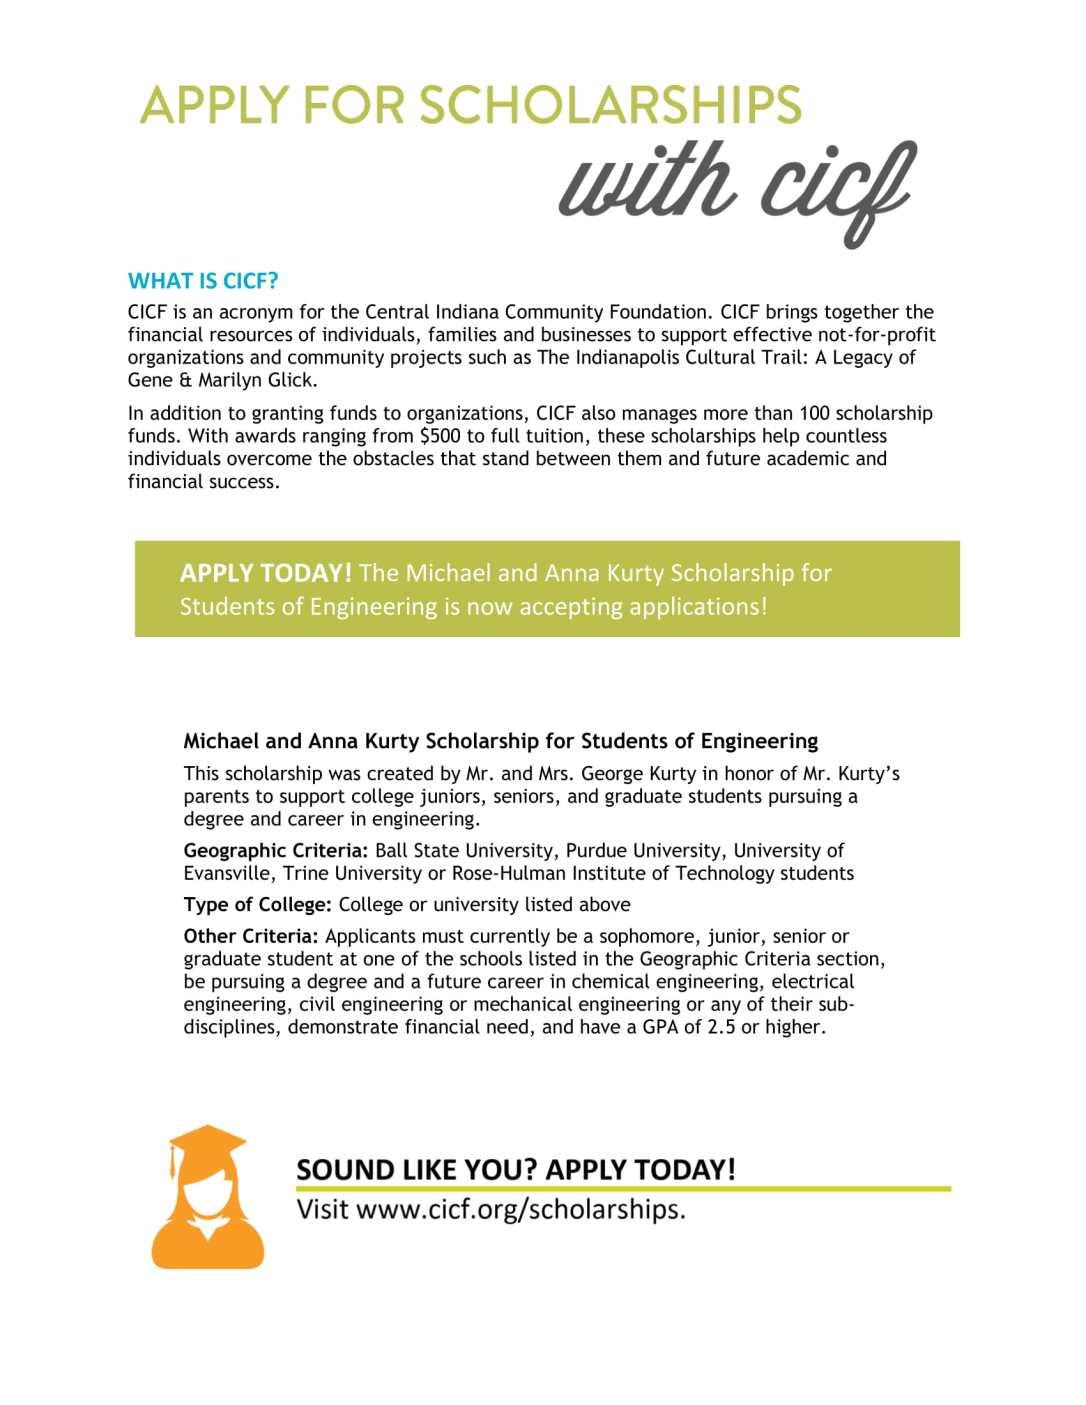 CICF Kurty Engineering Scholarship Flyer-1